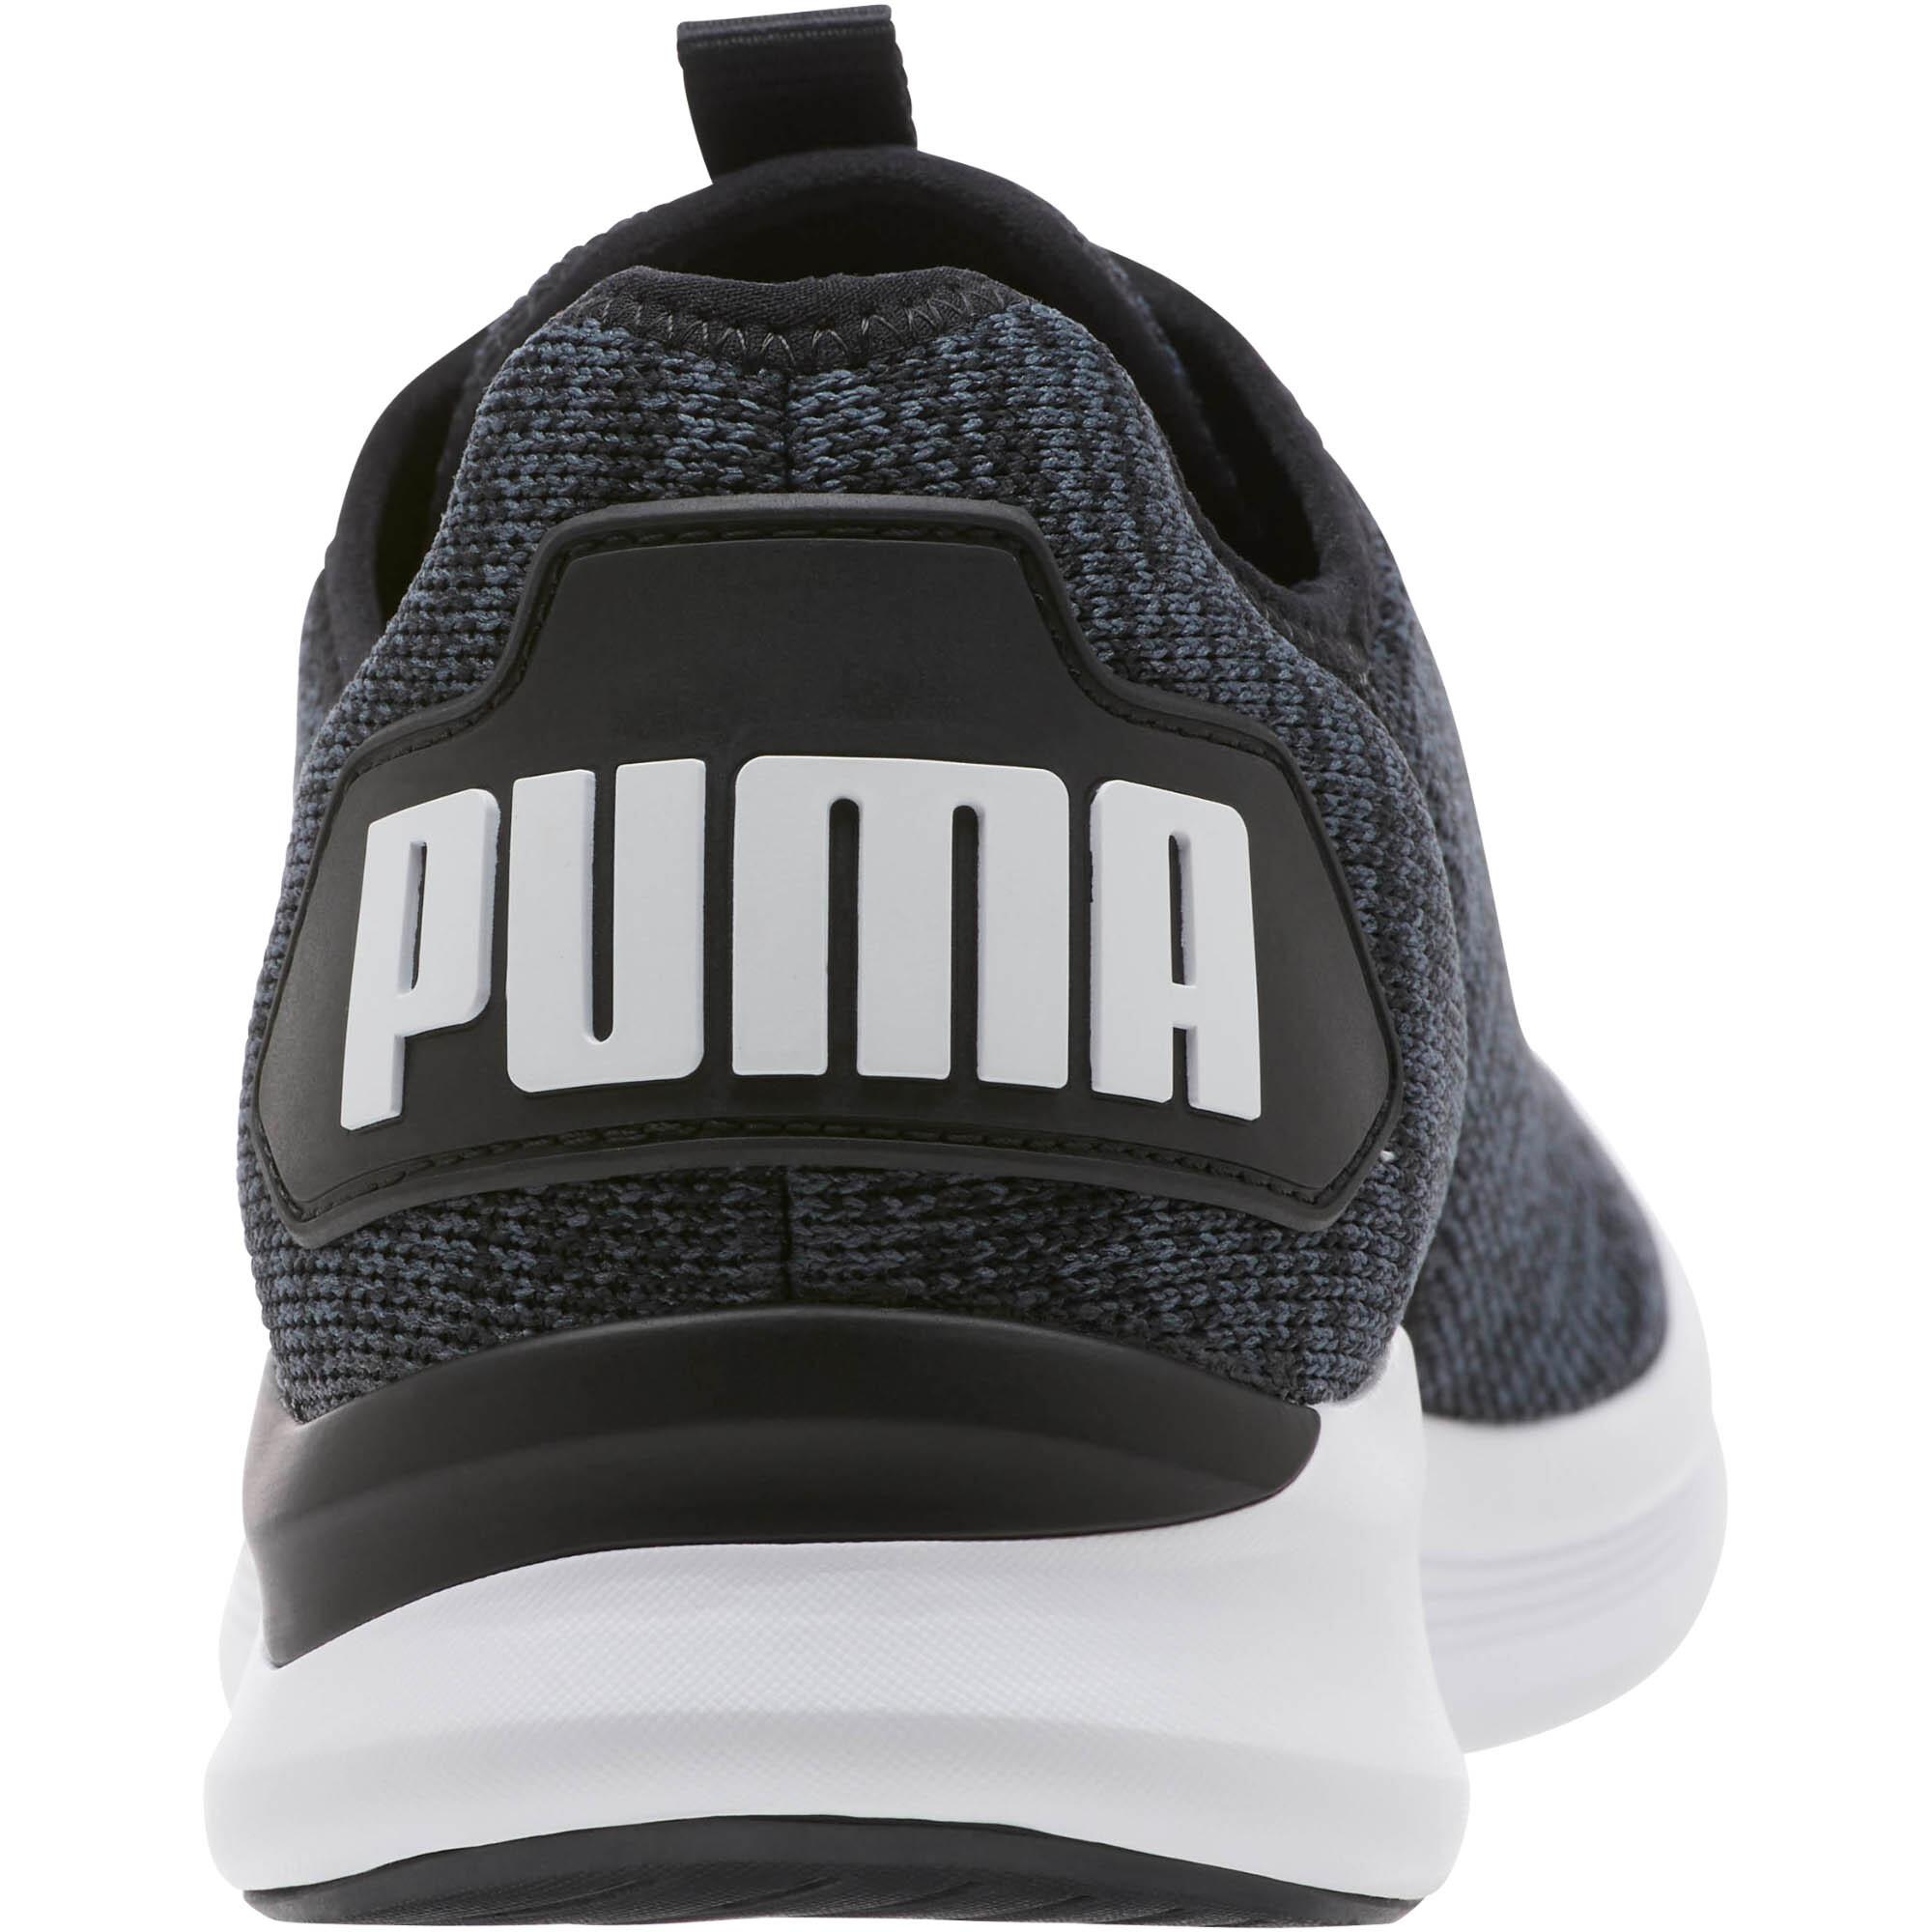 PUMA-Ballast-Men-039-s-Running-Shoes-Men-Shoe-Running thumbnail 10